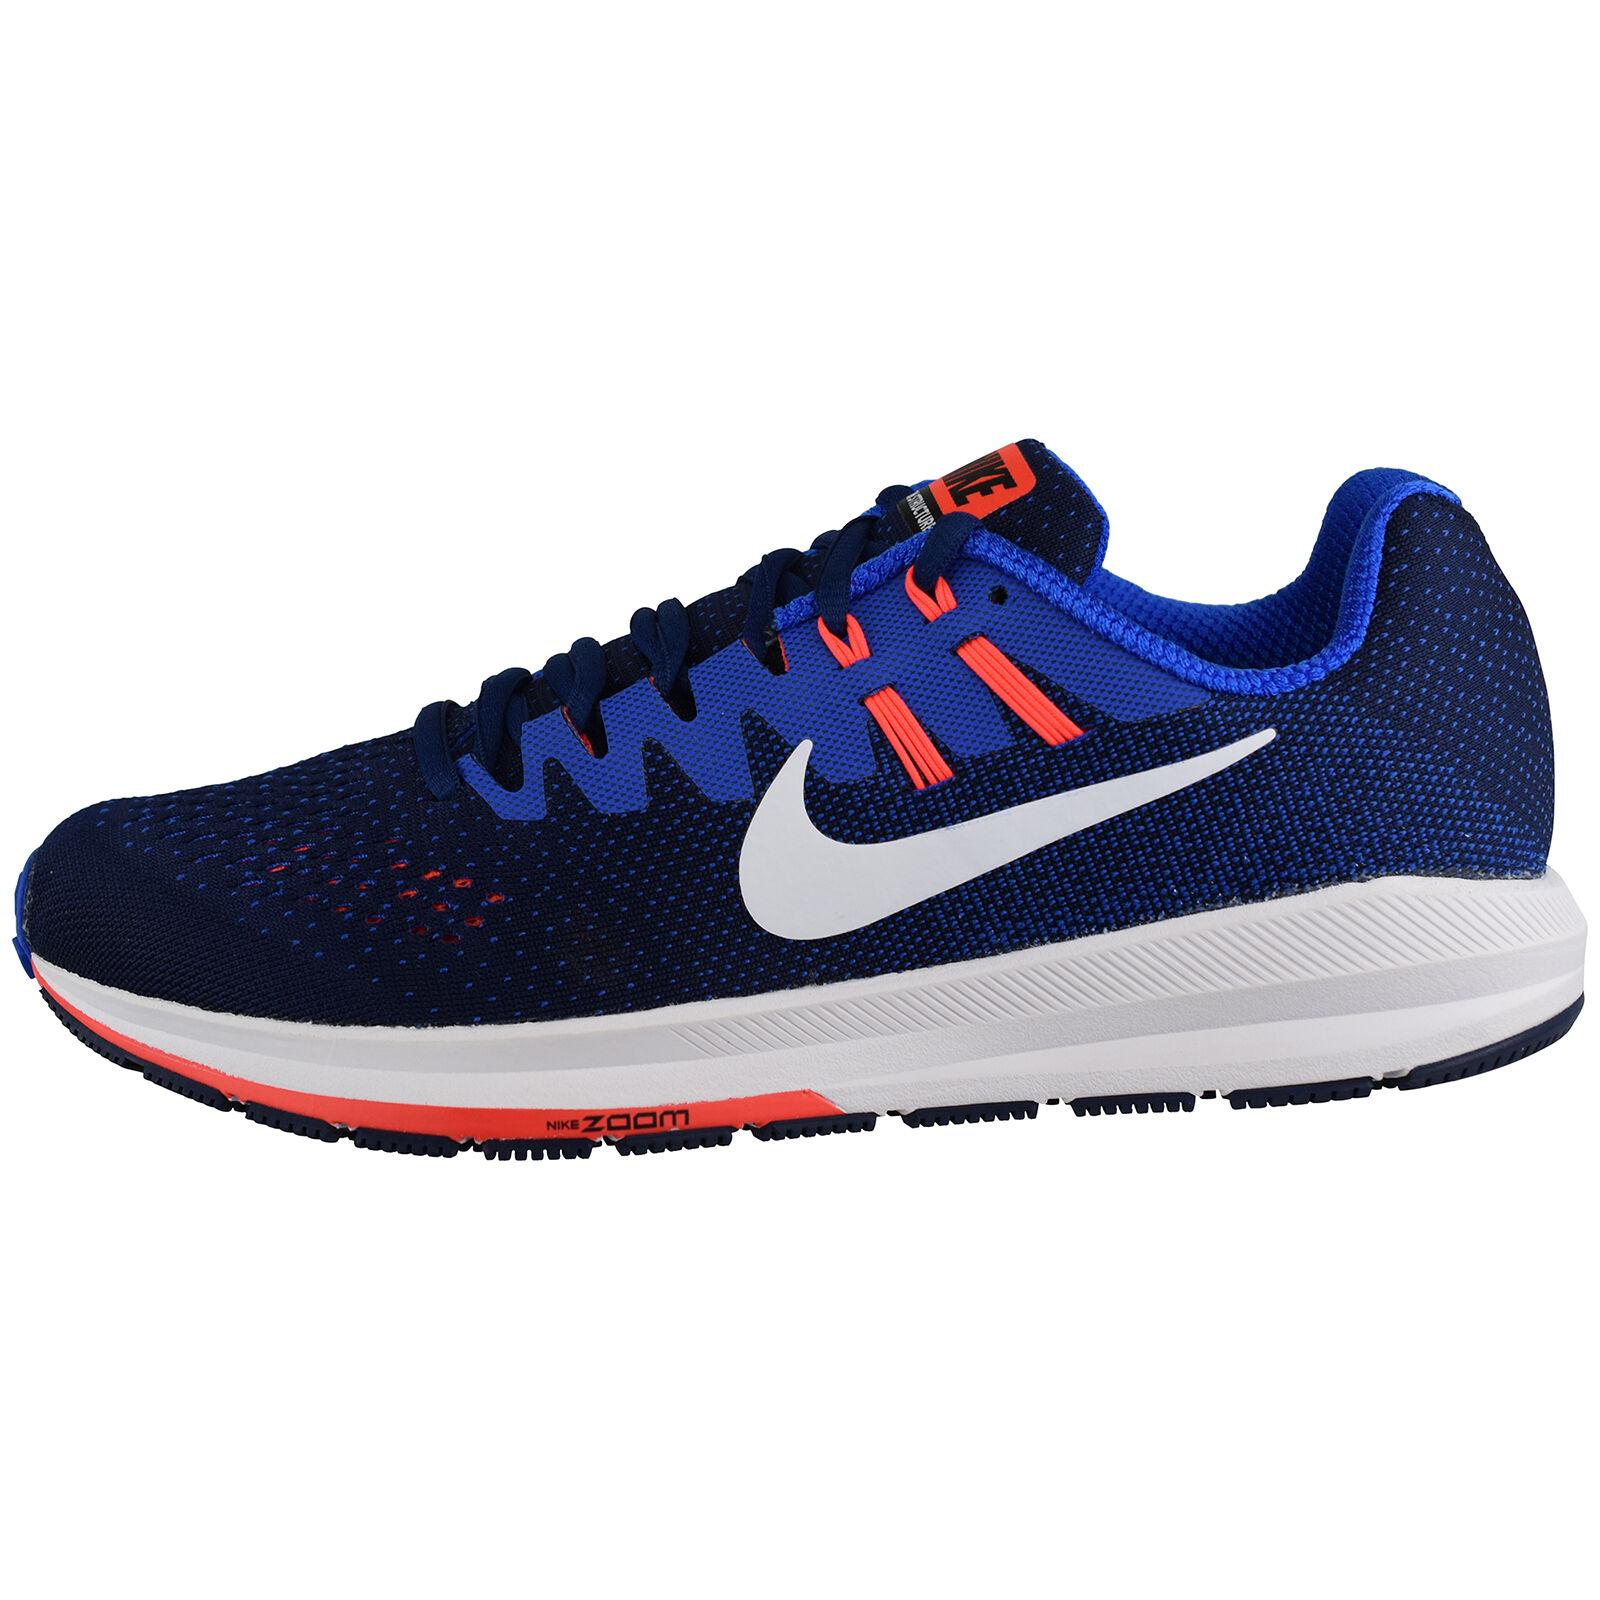 Nike 849576-400 Air Zoom Structure 20 849576-400 Nike Joggen Laufschuh Running Freizeit Sneaker b970db